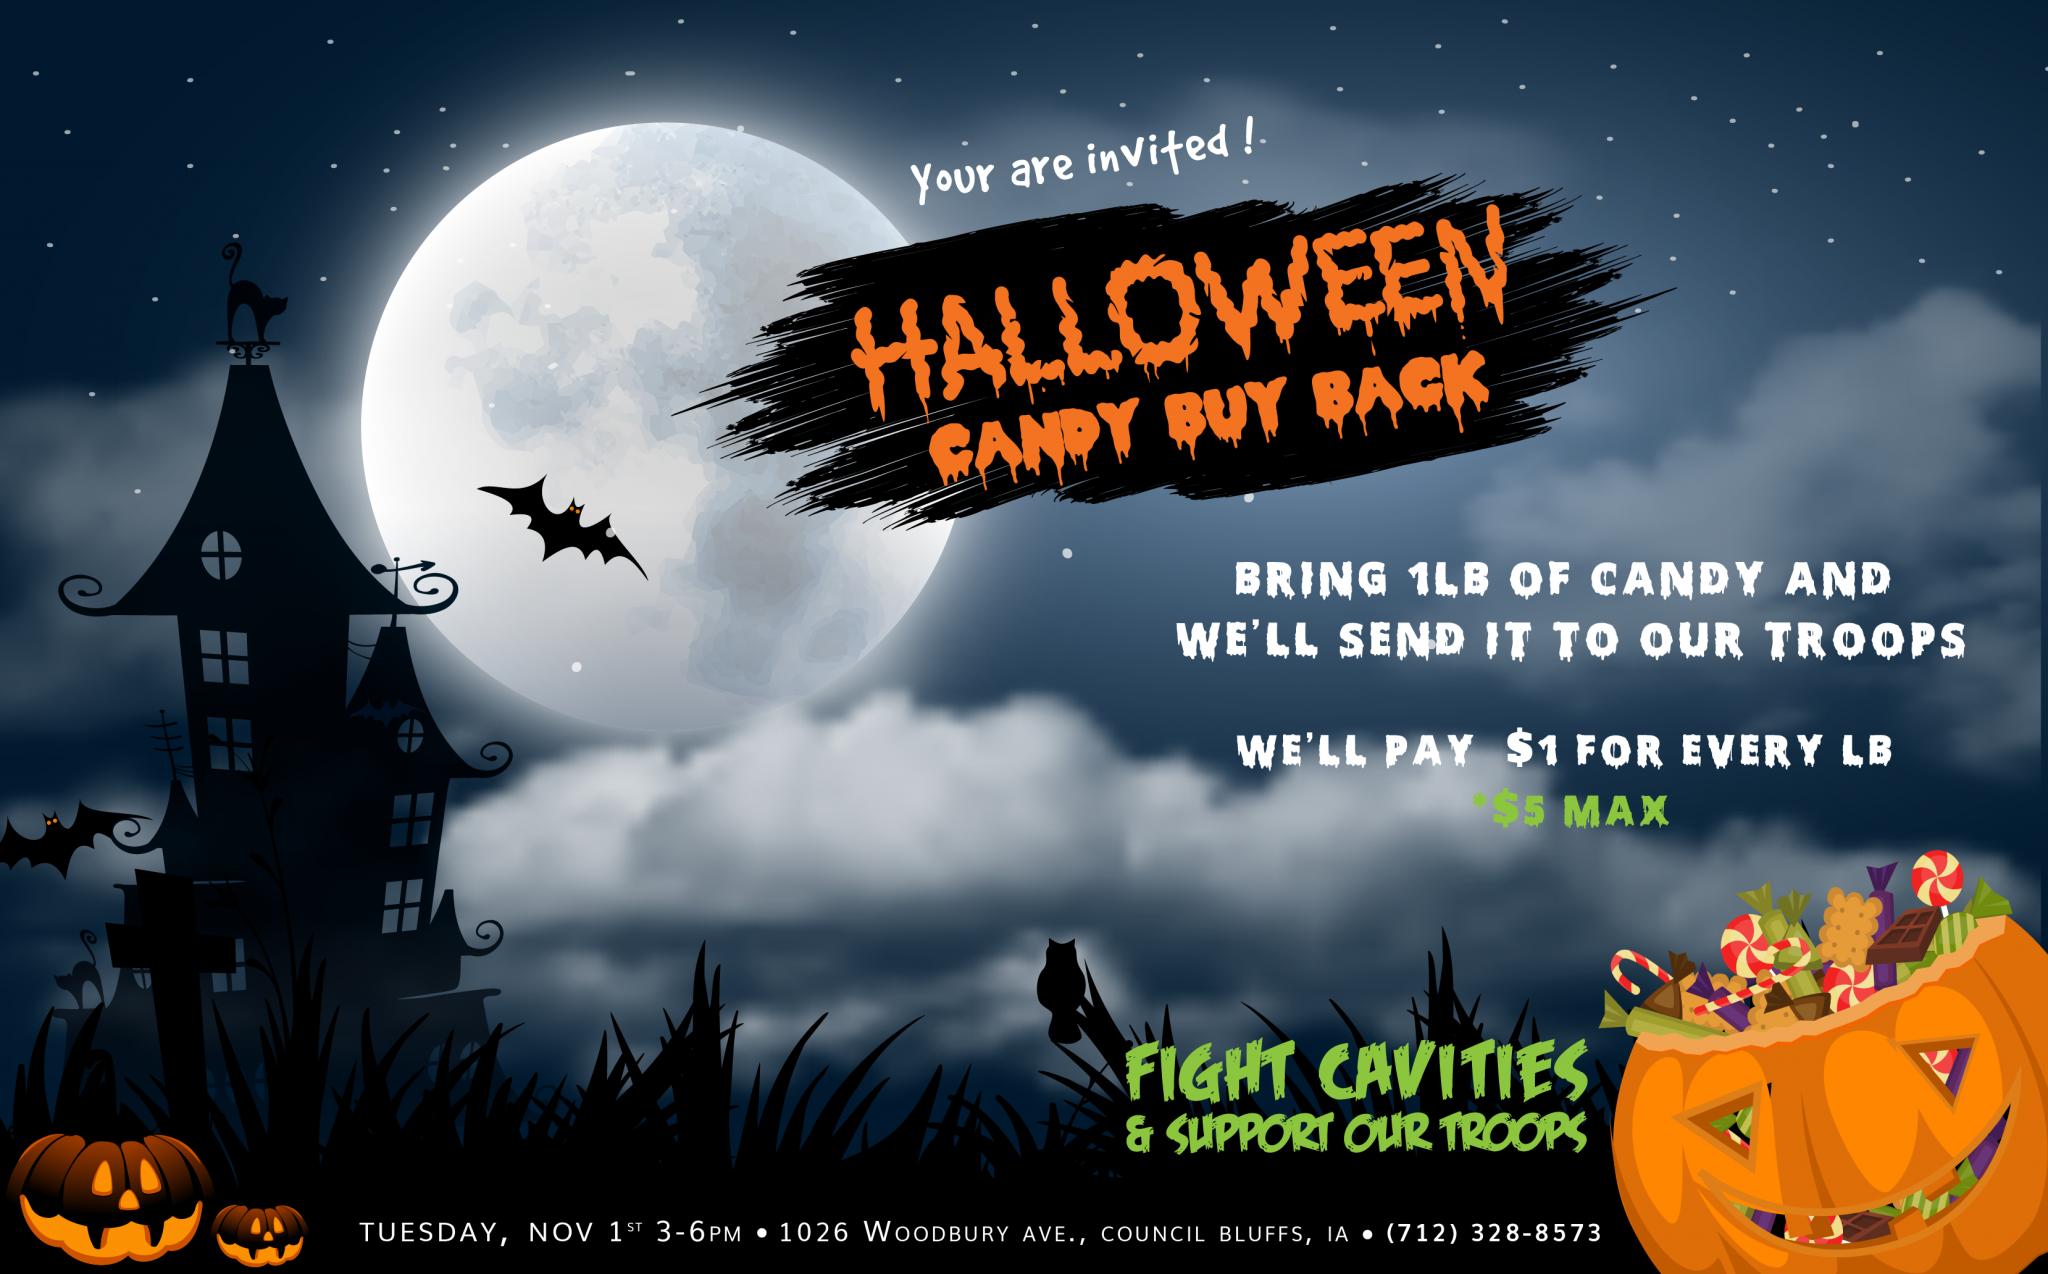 Omni Halloween poster